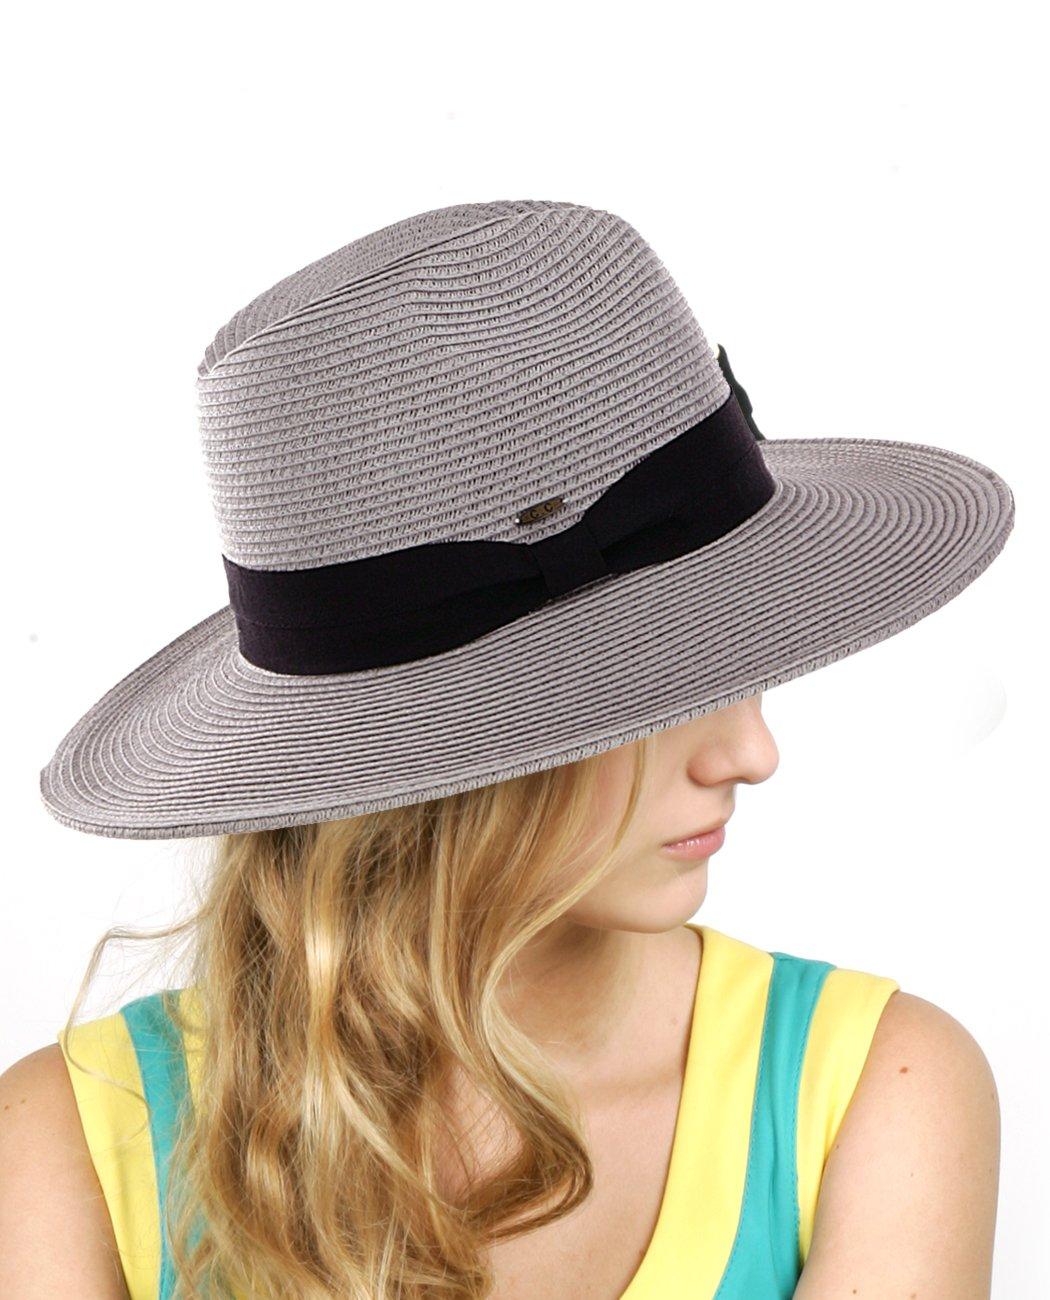 NYFASHION101 Lightweight Solid Color Band Braided Panama Fedora Sun Hat Black ST02-BK